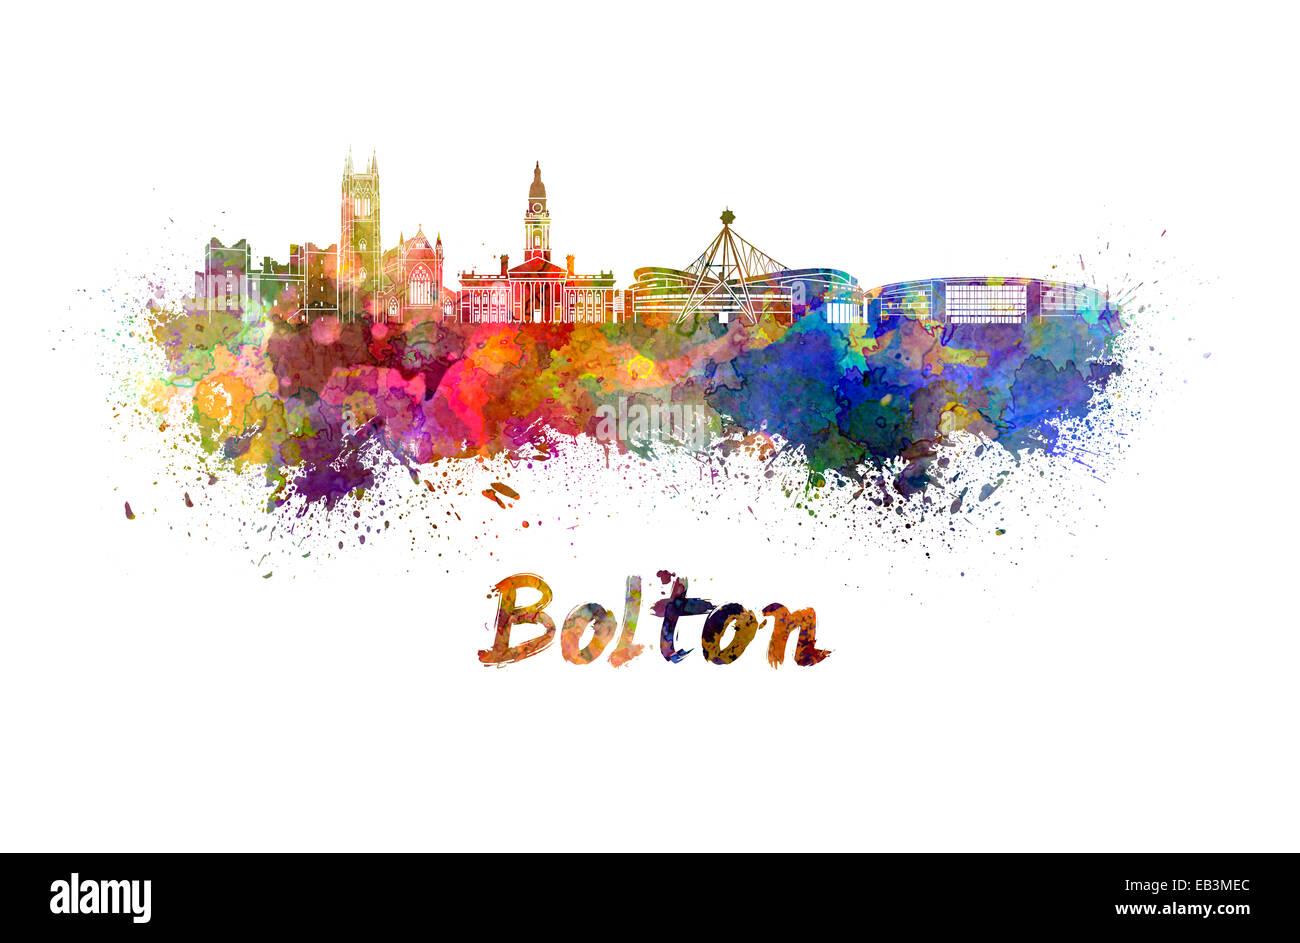 Bolton skyline in watercolor splatters - Stock Image